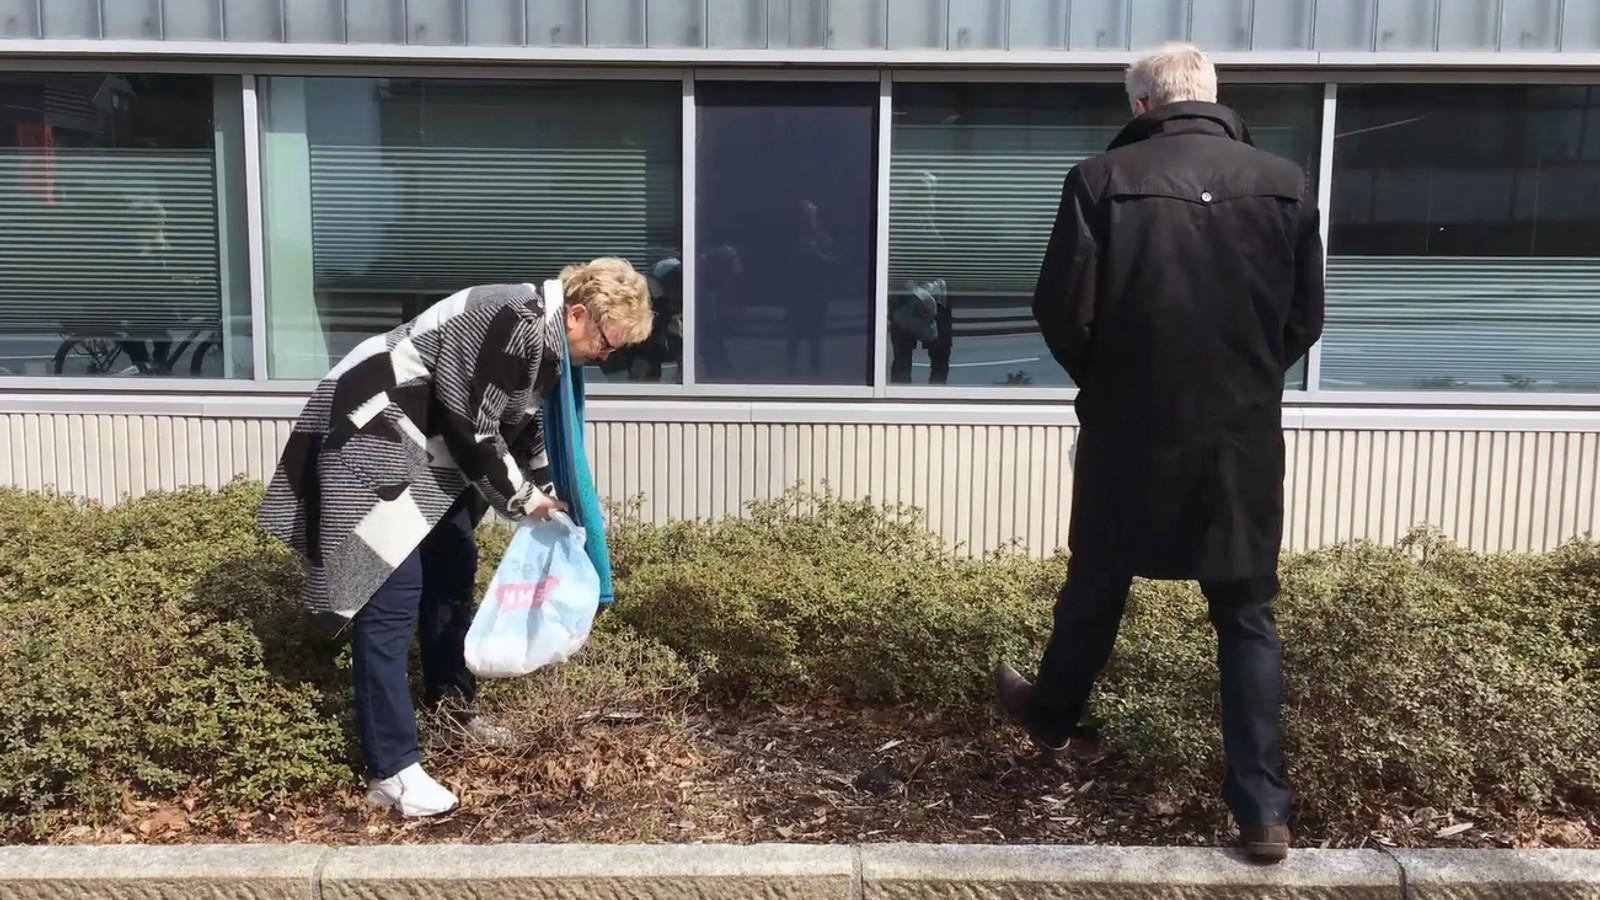 Fylkesmann Magnhild Meltveit Kleppa og assisterande fylkesmann Harald Thune tok ei ryddeøkt i nærområdet rundt Statens Hus i Stavanger.